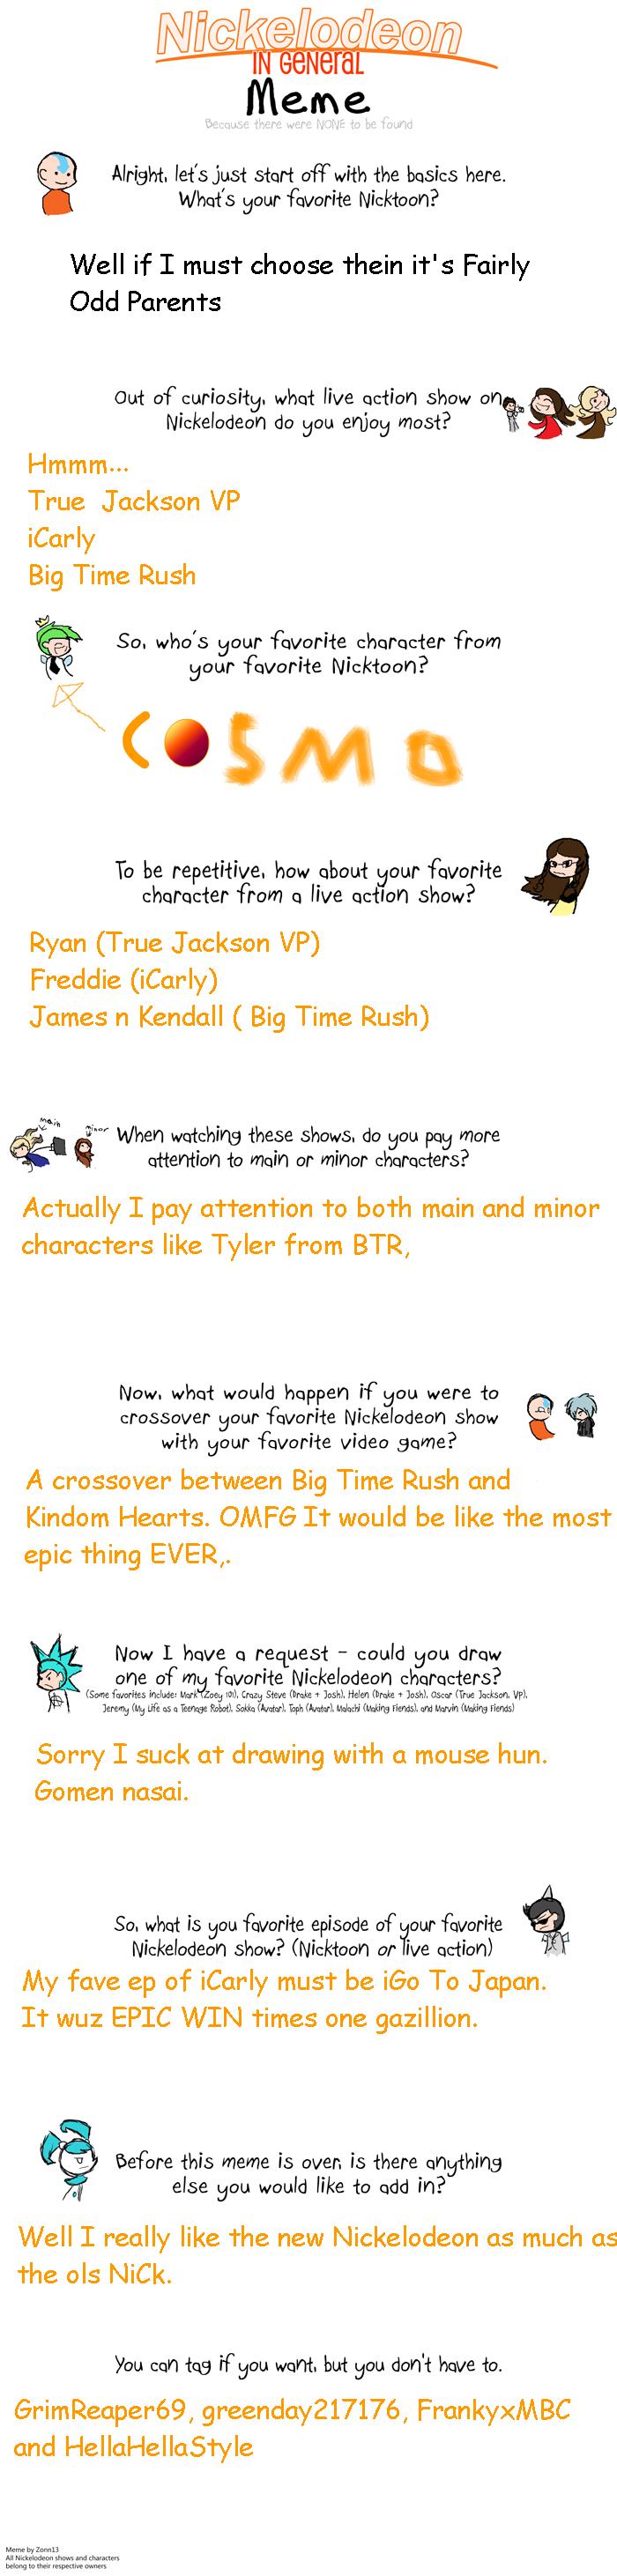 Nickelodeon Meme by Xi... Nickelodeon Meme